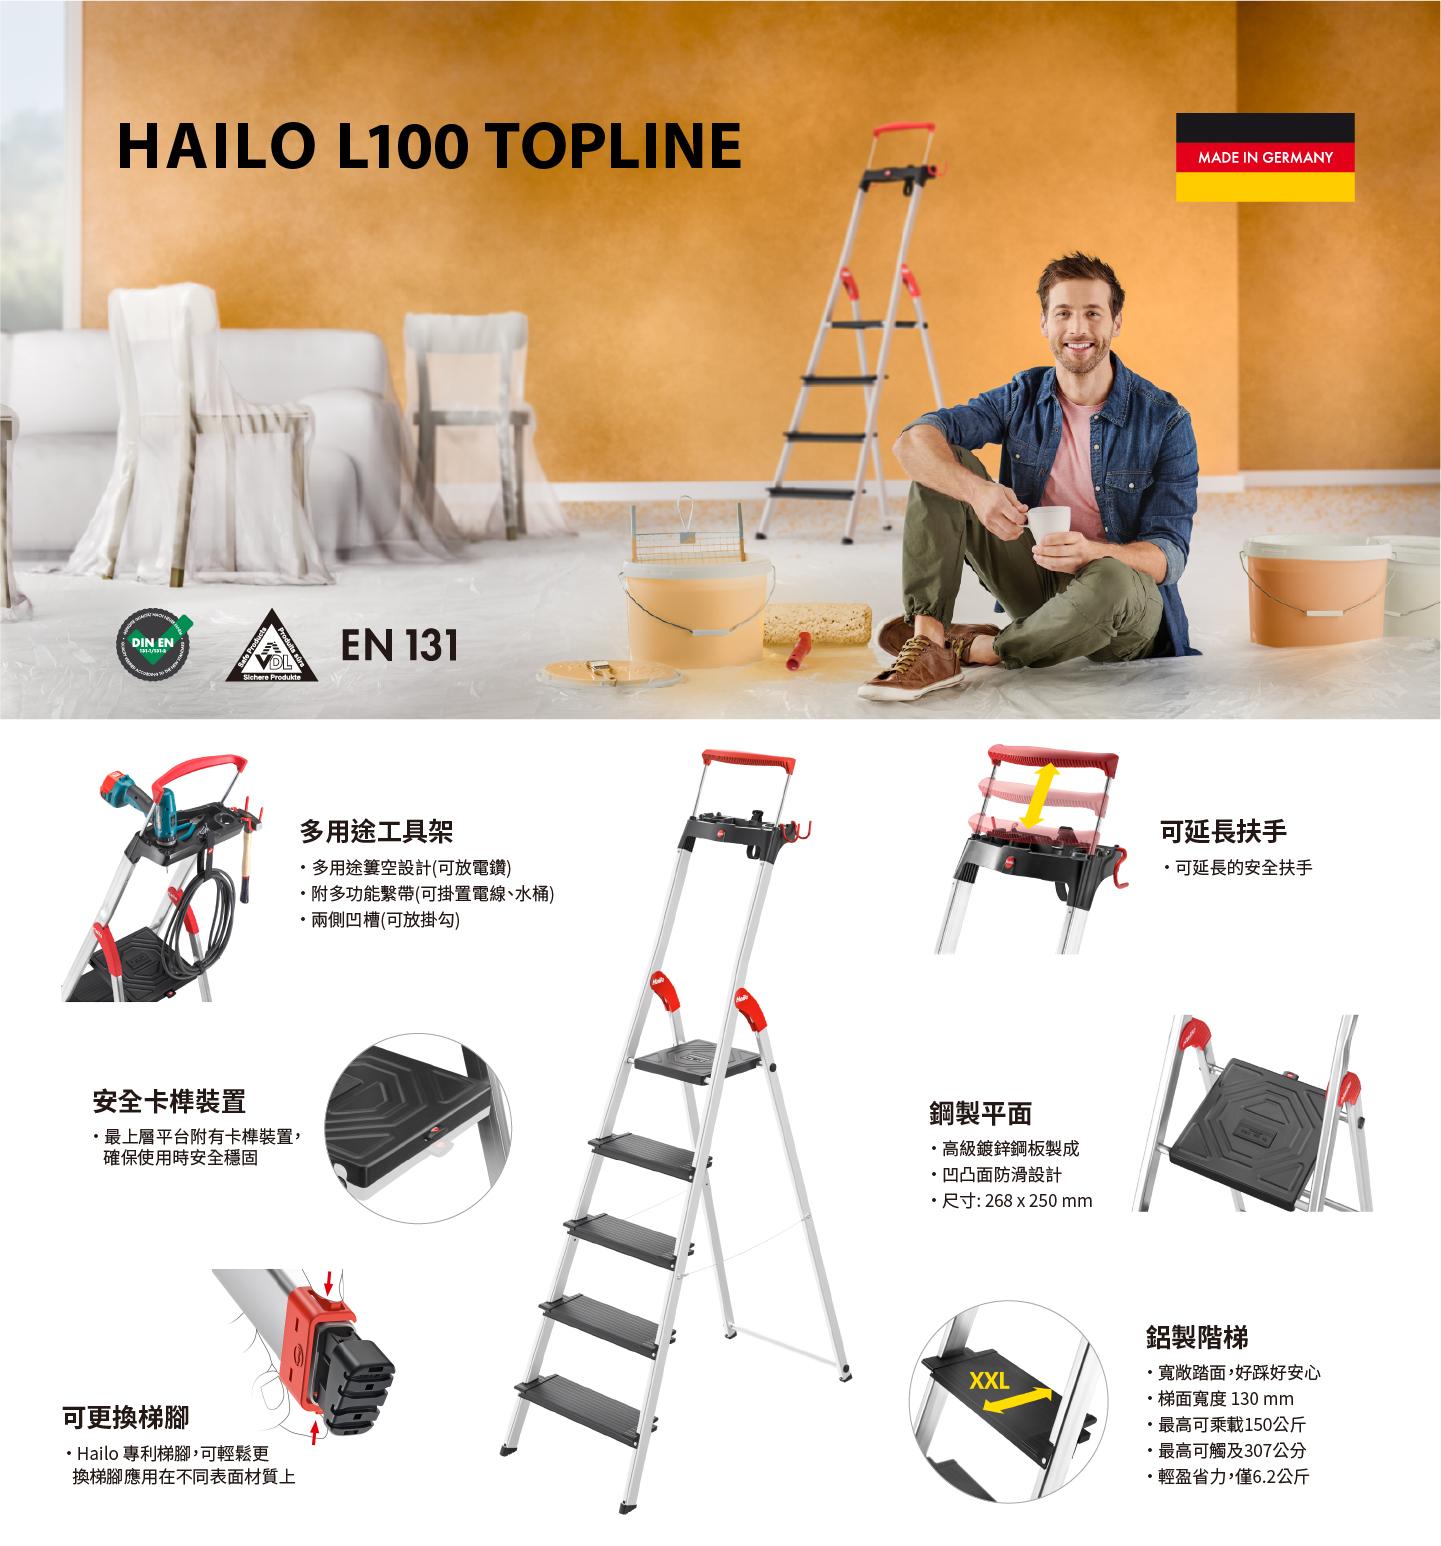 Hailo-L100Topline-5steps